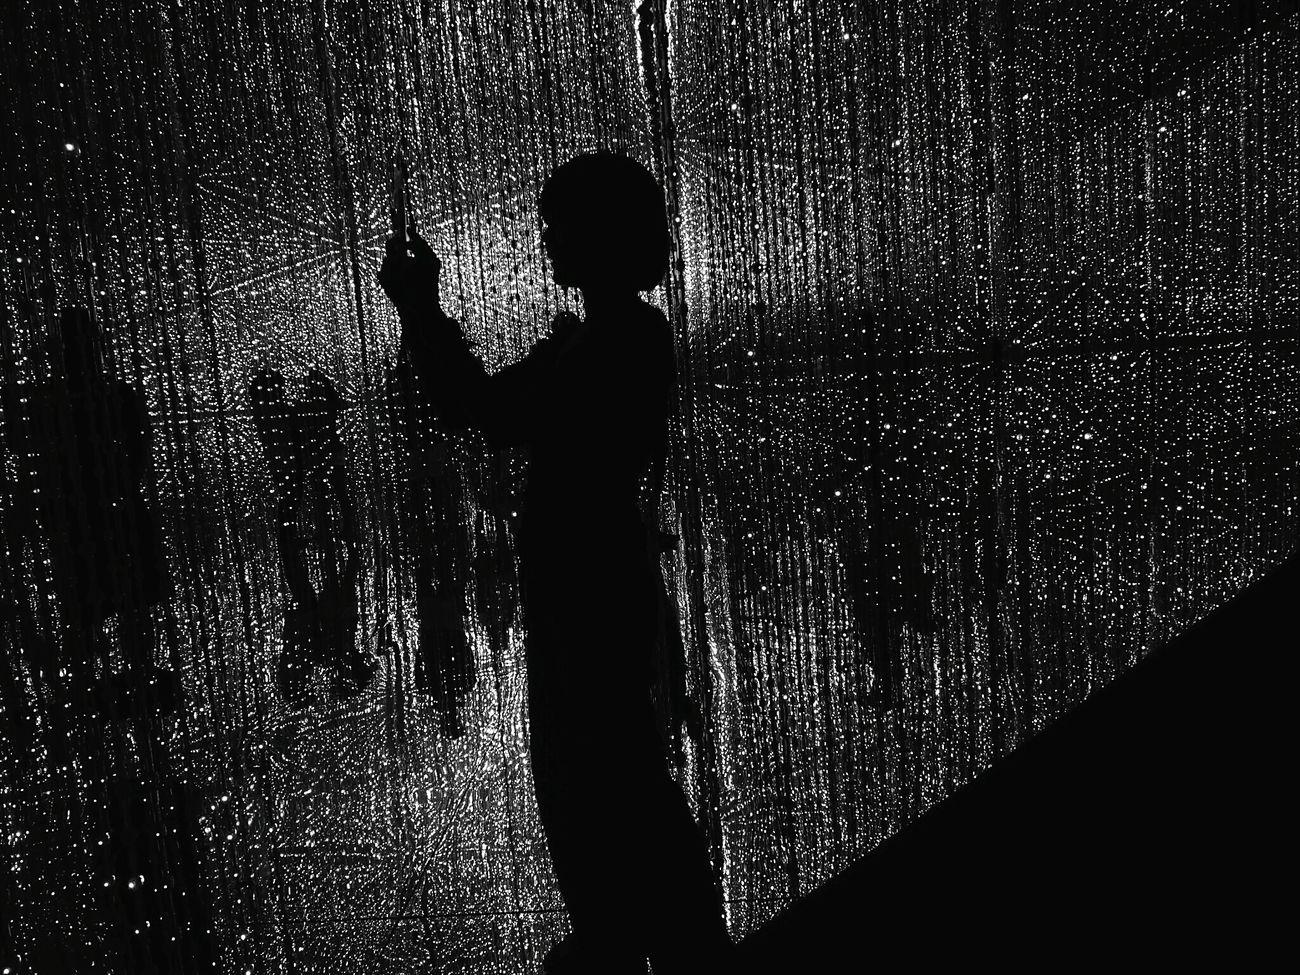 My Year My View Silhouette Silhouettes Silhouette_collection Silhouette Photography Silhouette Collection Silhouettes Of People Silhouettes And Shadows Silhouette_creative People Indoors  Illuminations Nightphotography Cityscape 東京 Monochrome Photography Lighting Equipment Illuminated Illumination Street Black Background モノクロ Monochrome _ Collection Black And White Photography Cityscapes Blackandwhite Photography